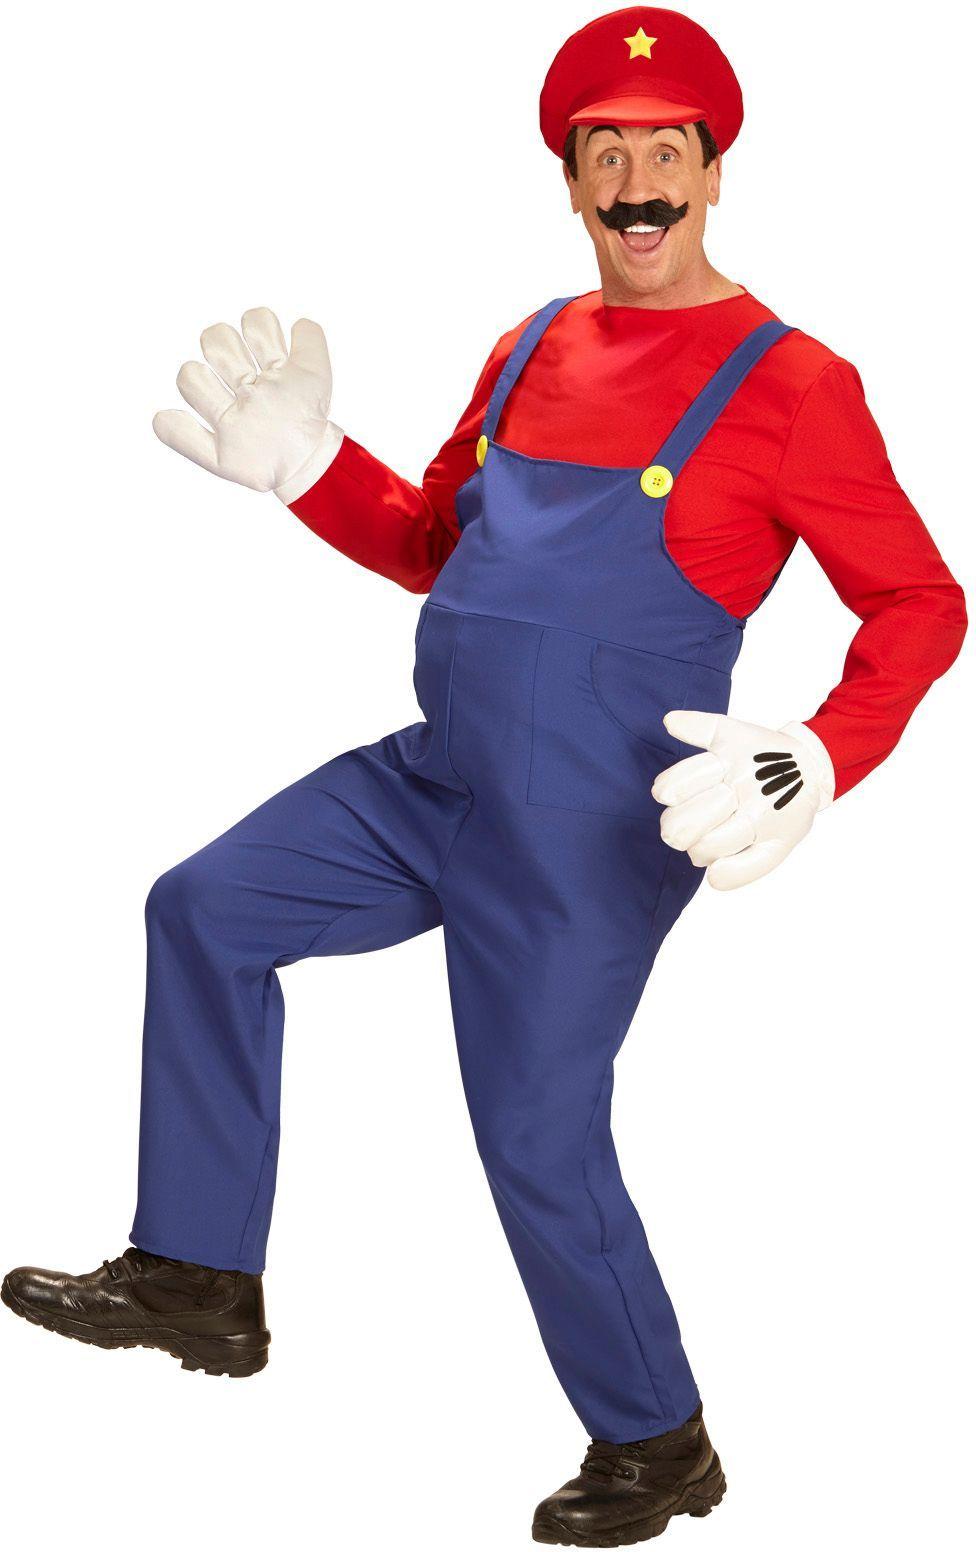 Mario pak